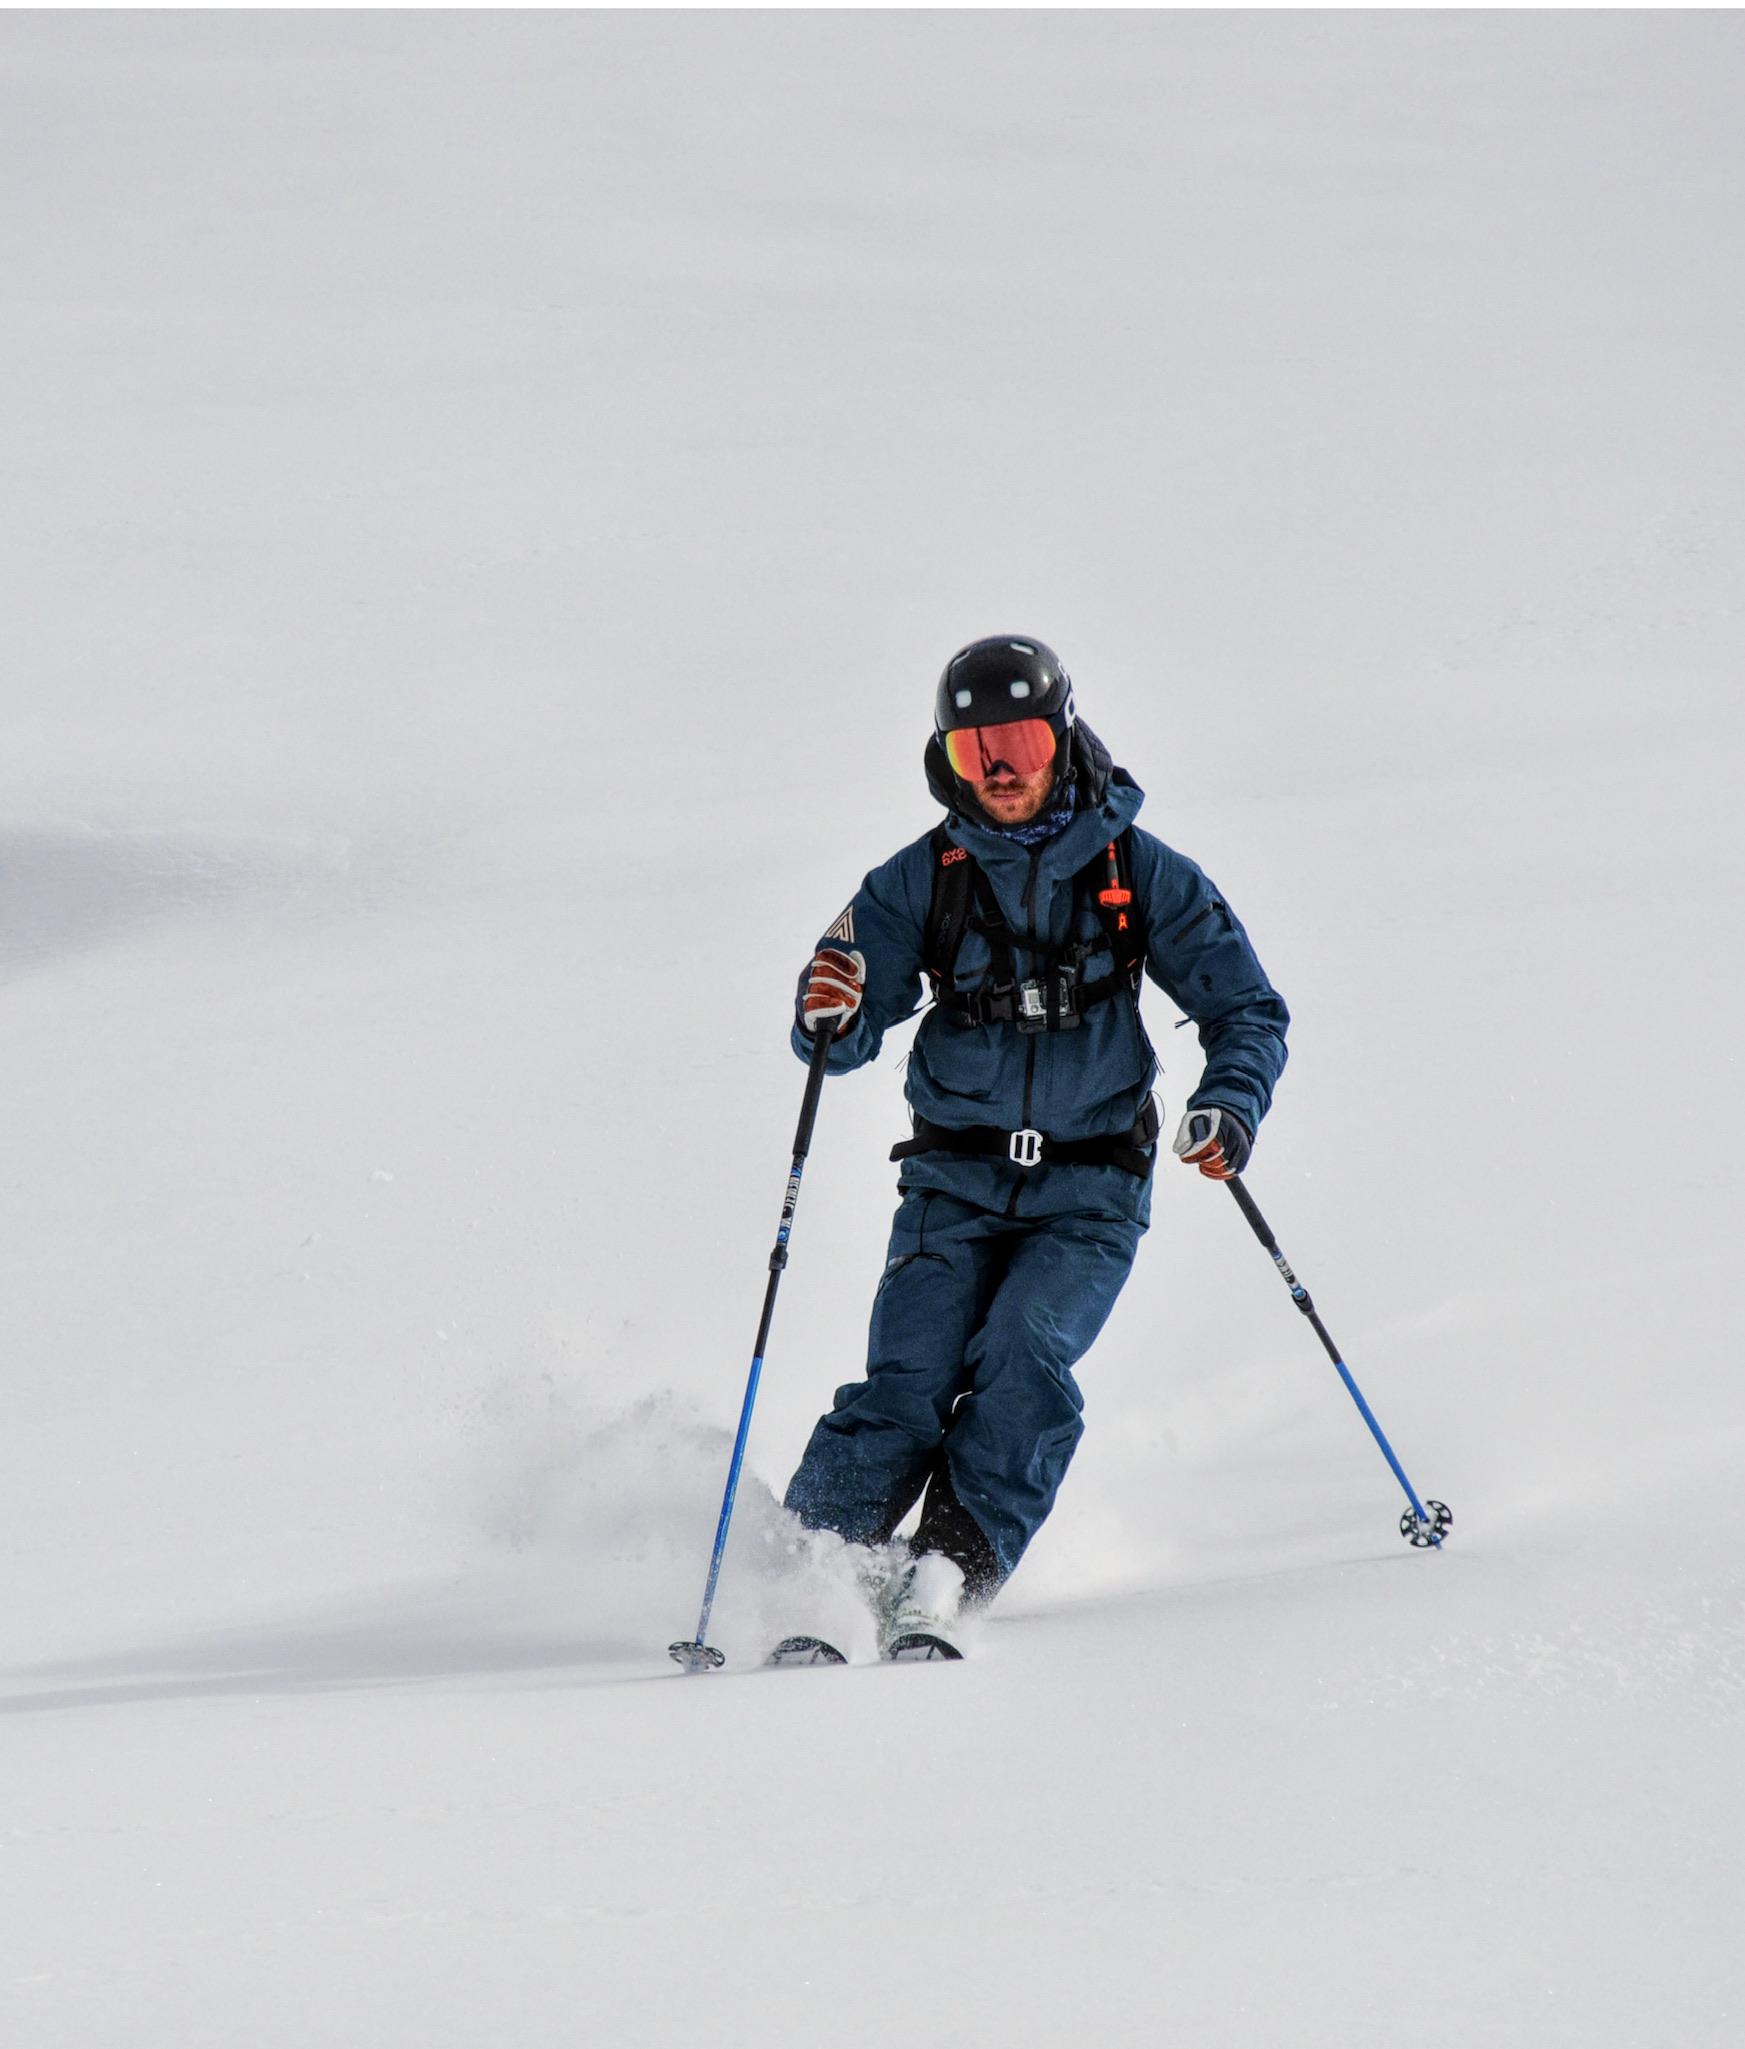 David skiing off piste